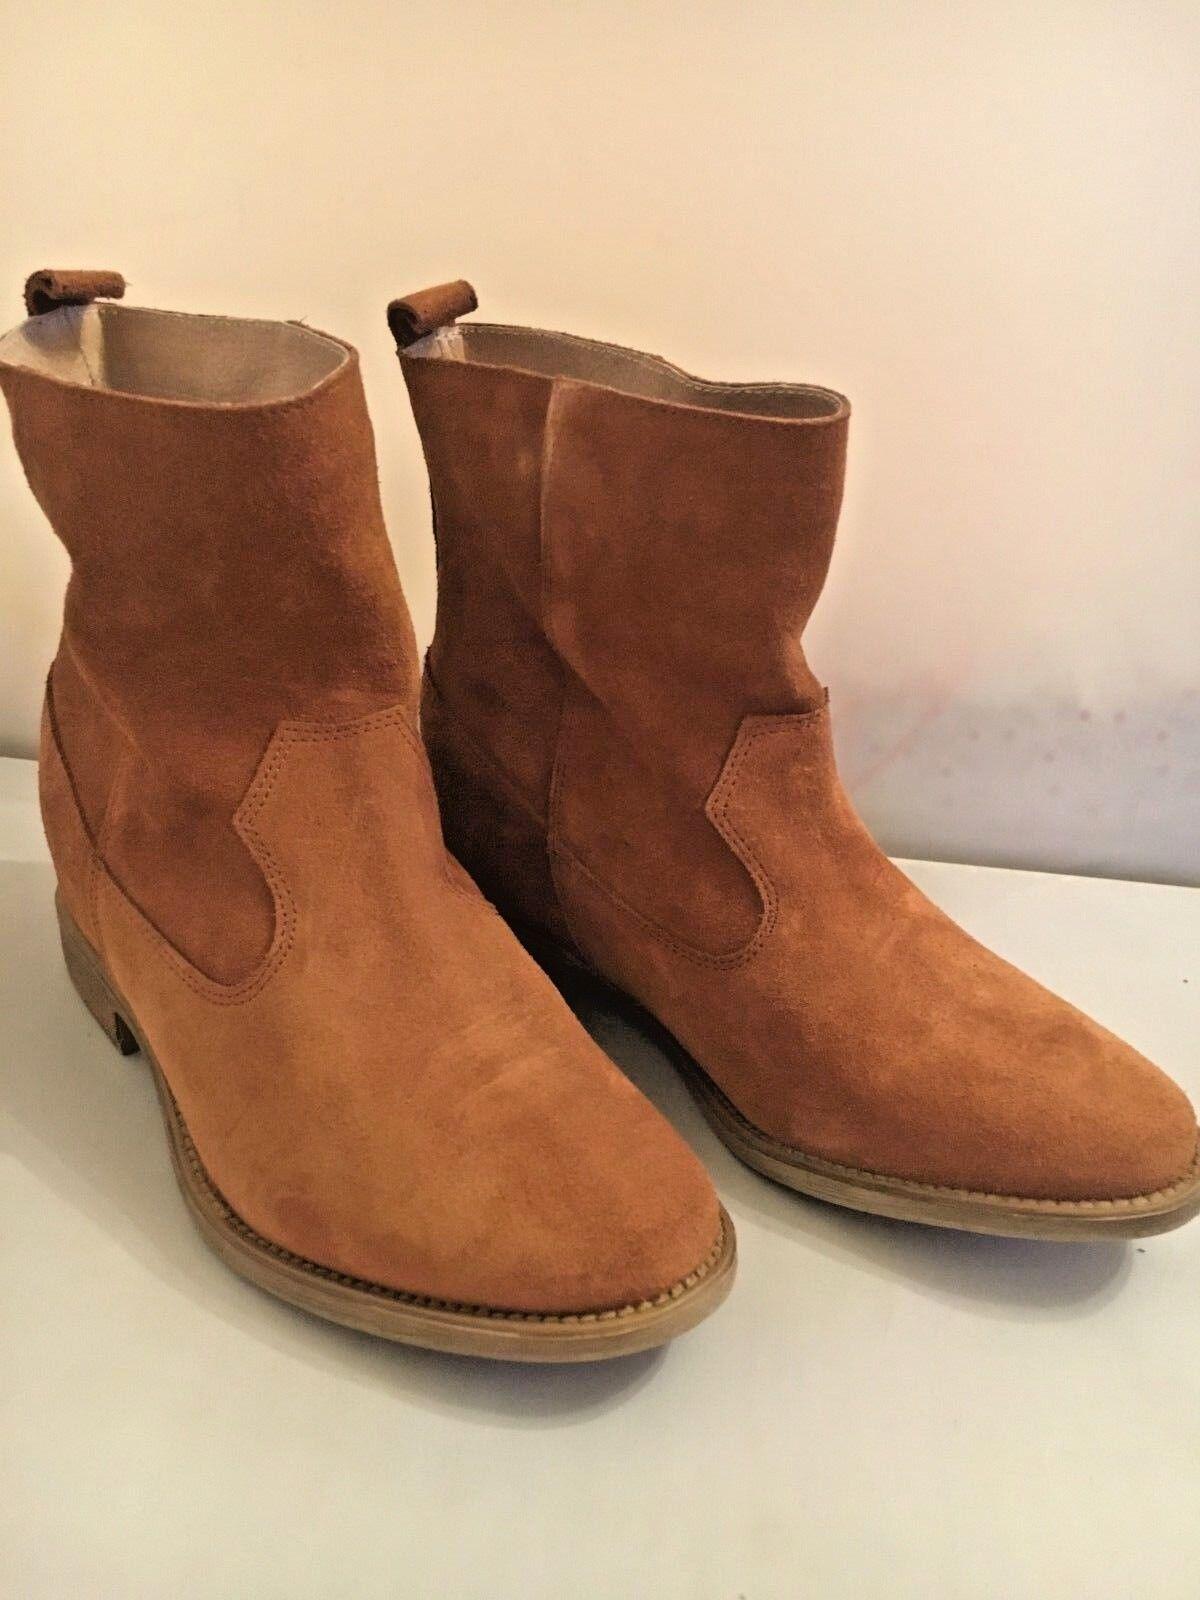 Anthropologie Gamuza Marrón Tirar Tirar Tirar botas al tobillo Botines España Talla 36 Nuevo  tienda de venta